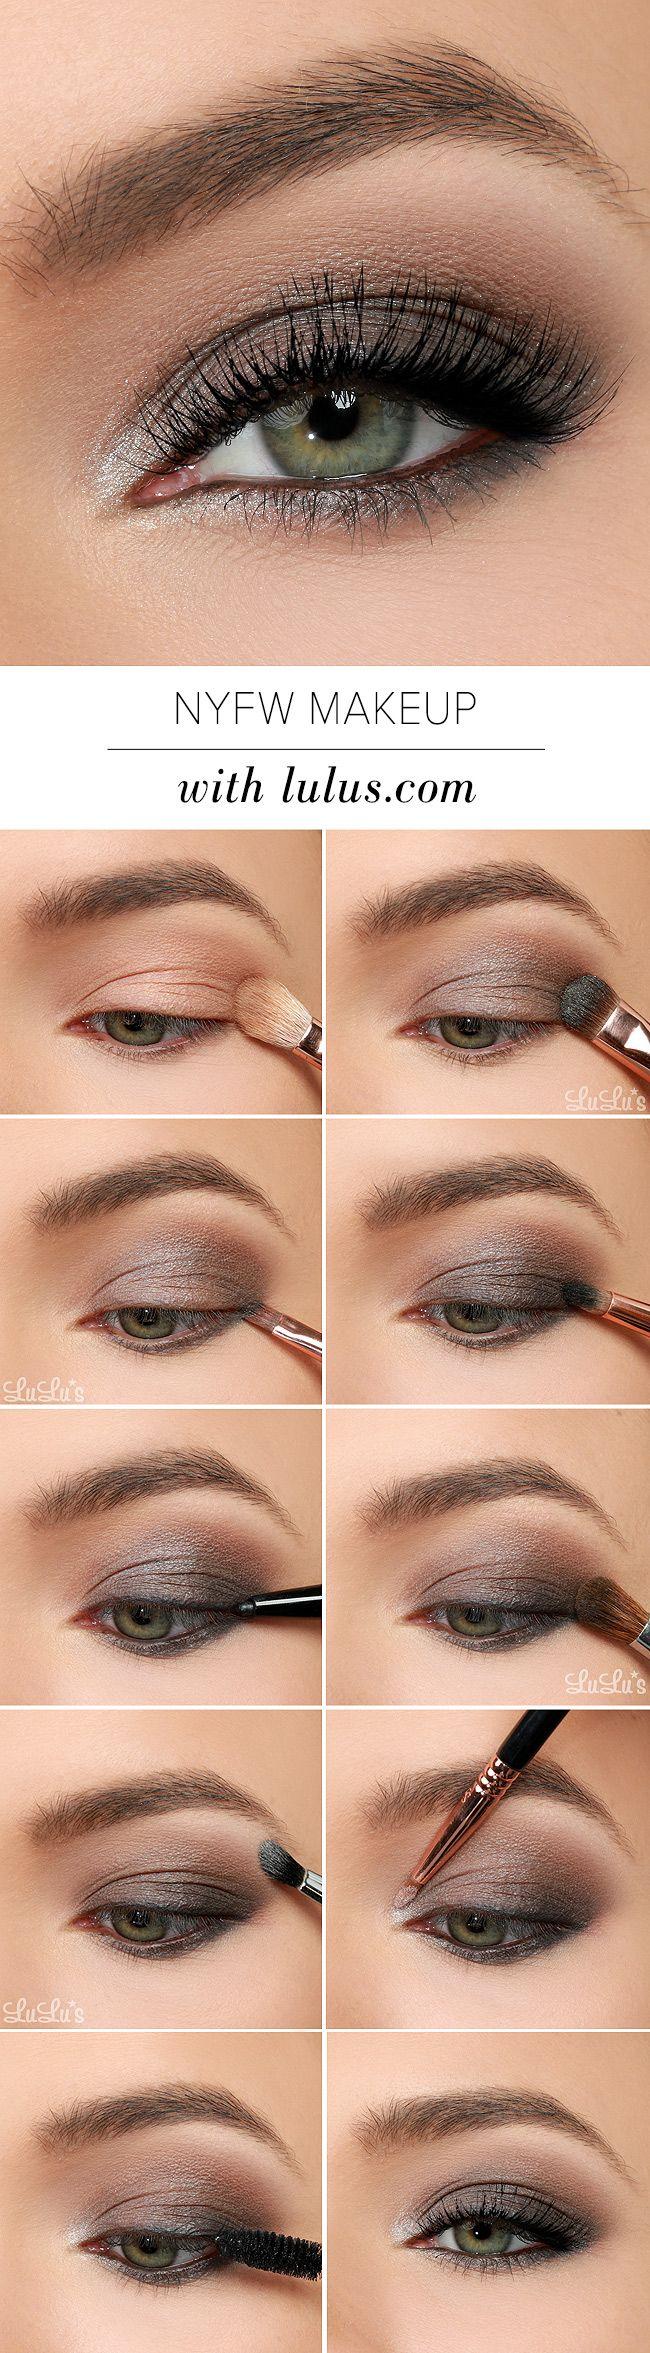 Lulus How To 2015 Nyfw Inspired Eye Shadow Tutorial New York